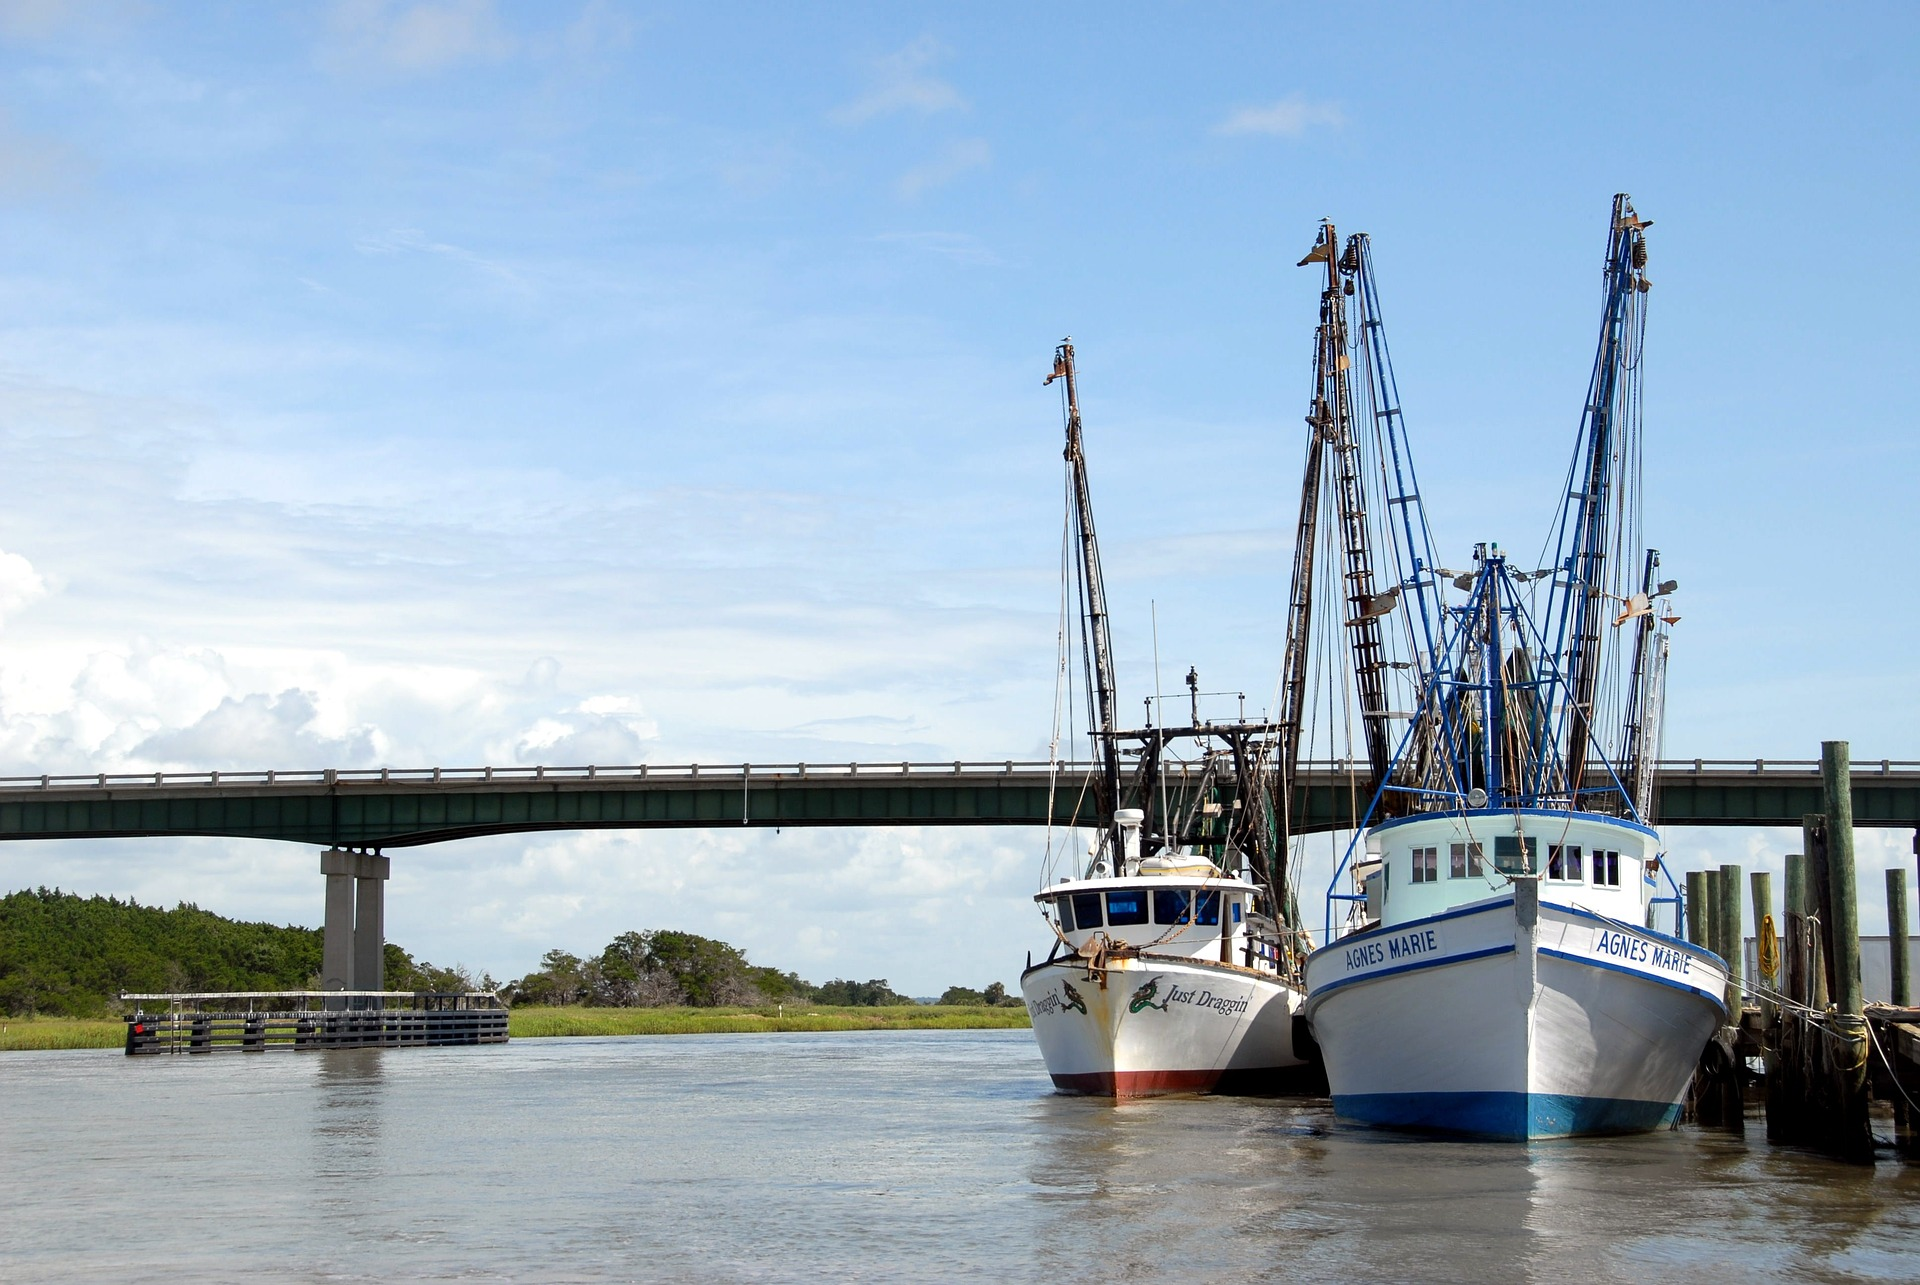 shrimp-boat-2431187_1920